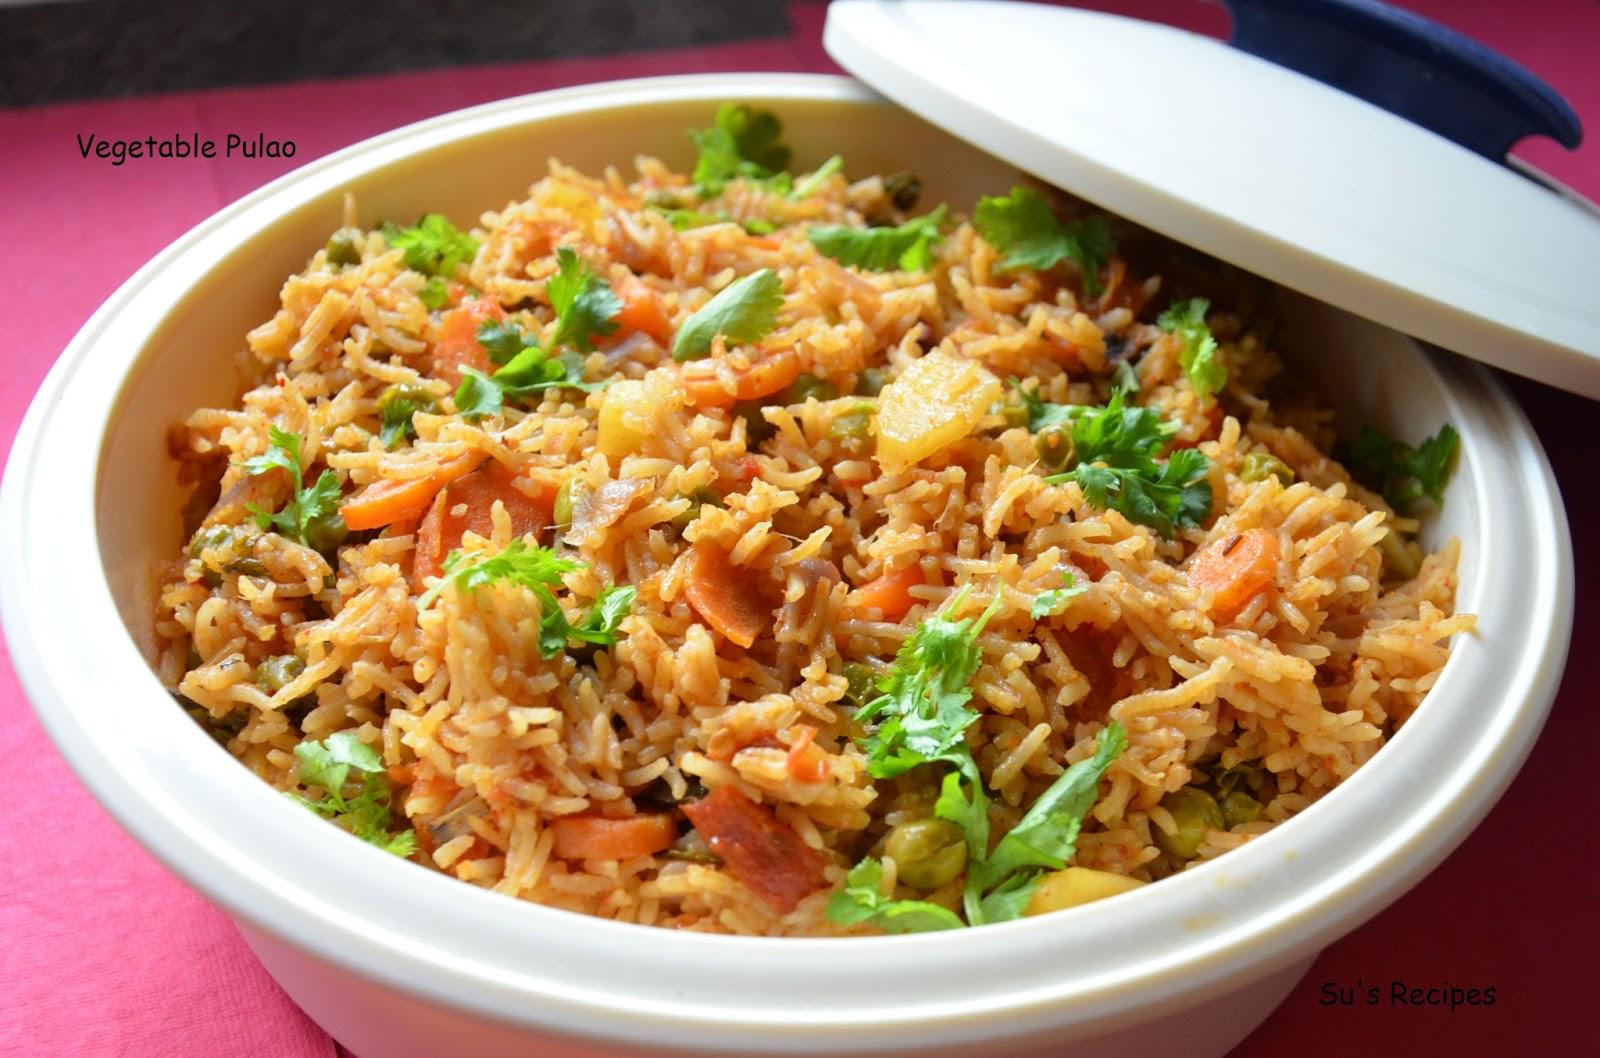 Su's Recipes: Vegetable Pulao